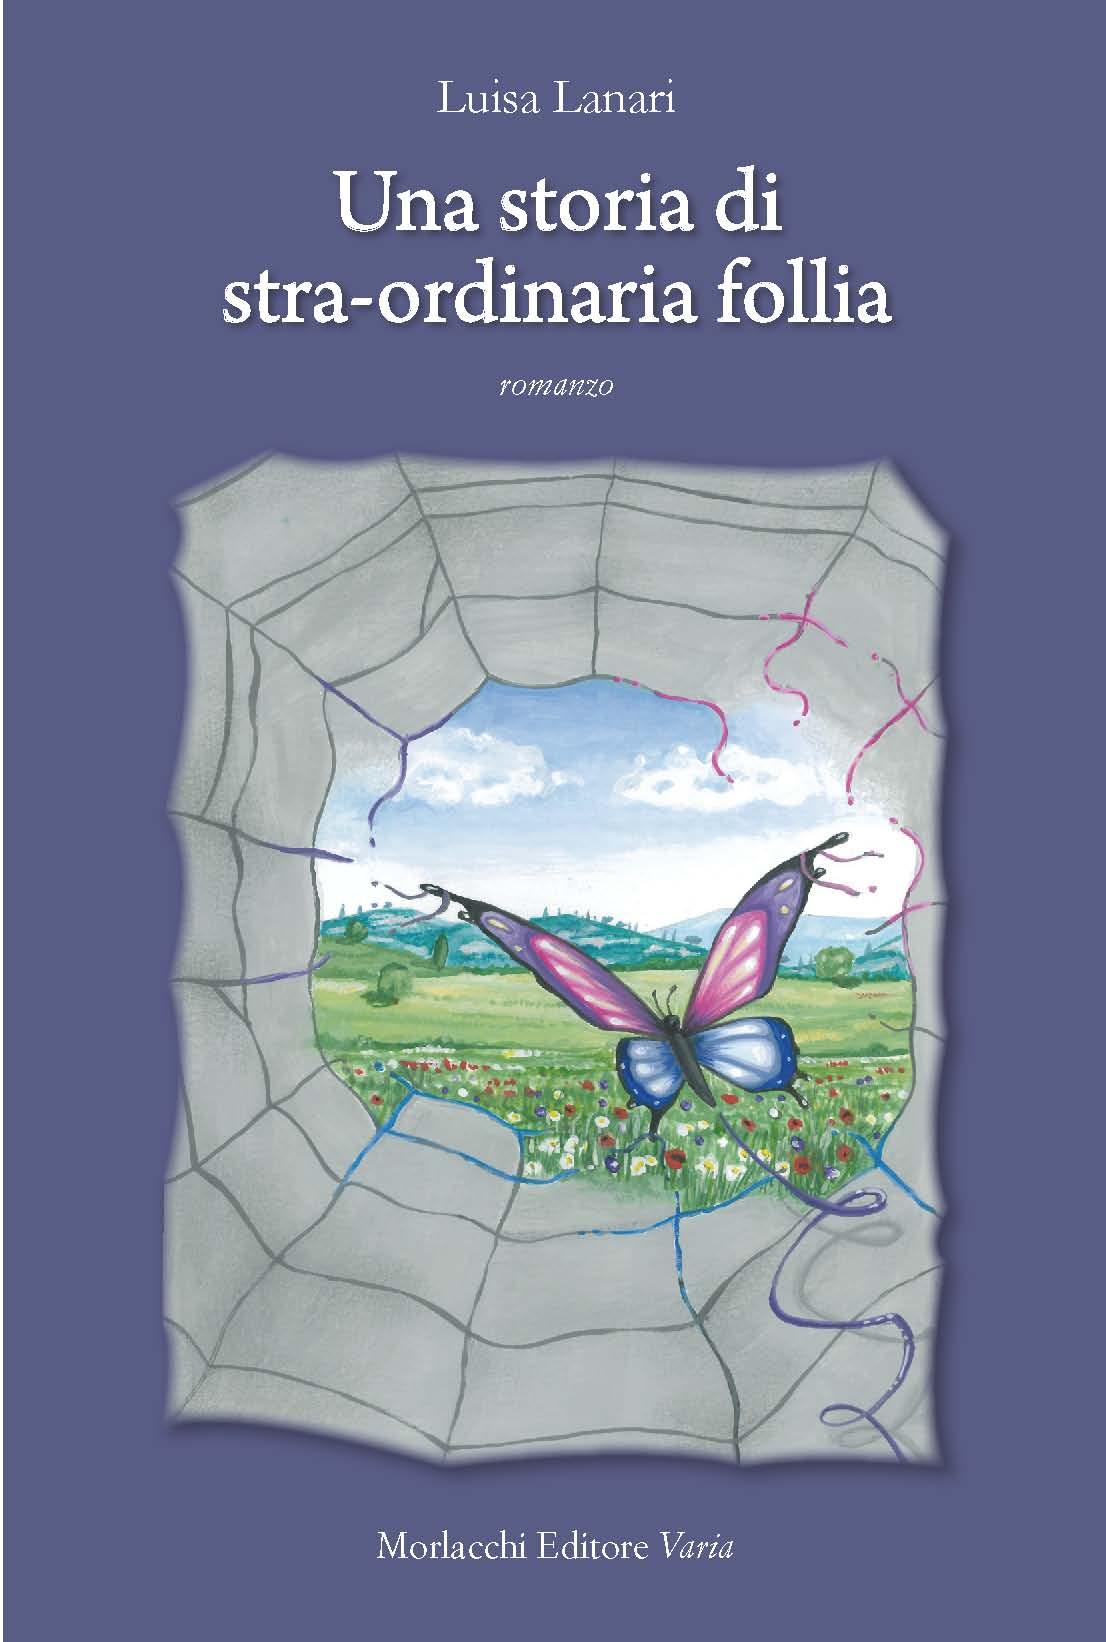 In copertina: disegno di Chiara Lanari. http://www.chiaralanari.com